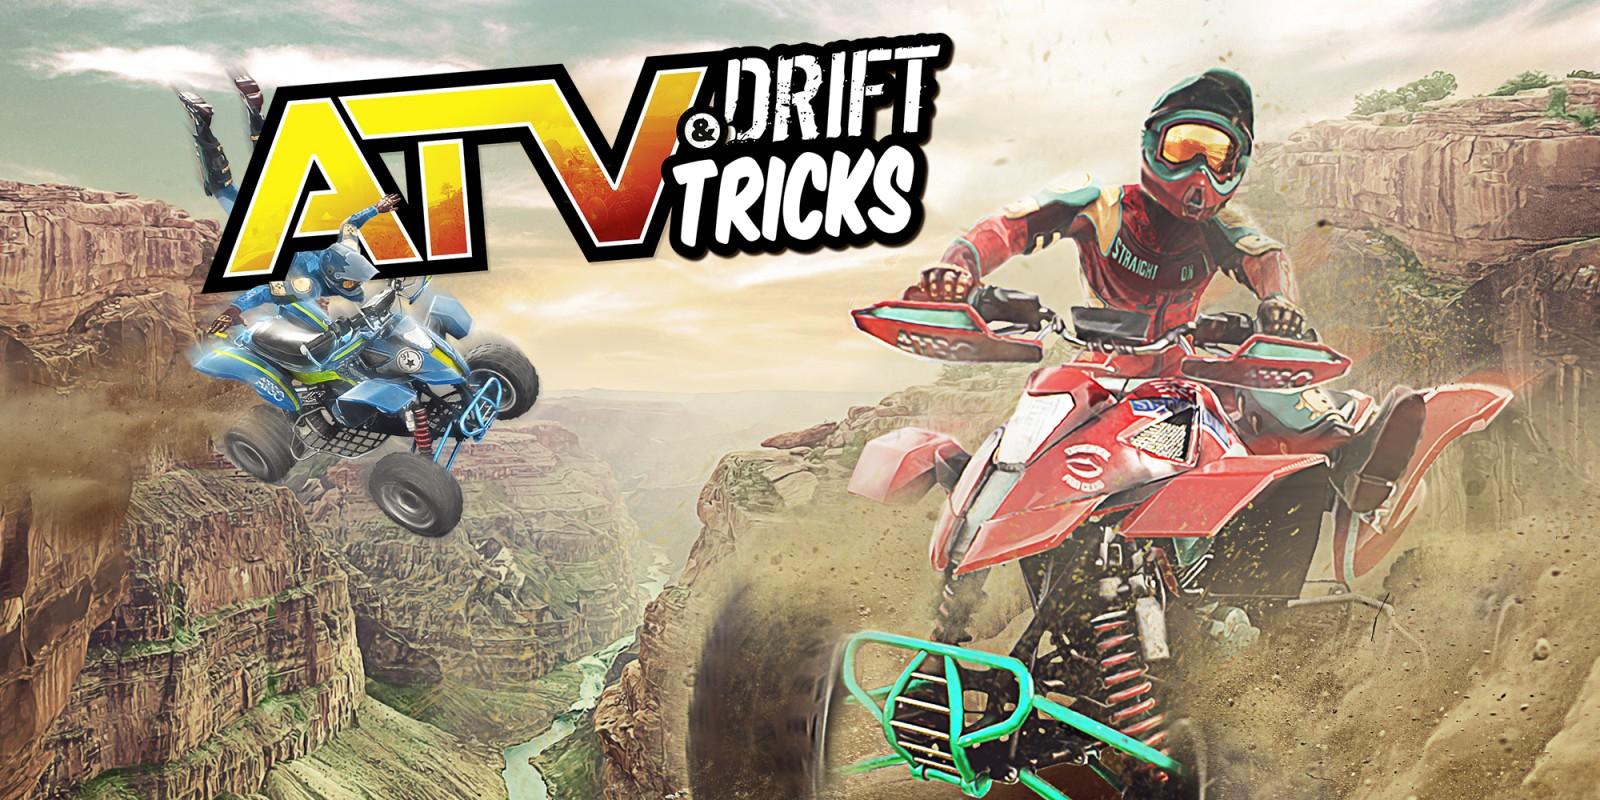 ATV Drift & Tricks (Nintendo Switch eShop)